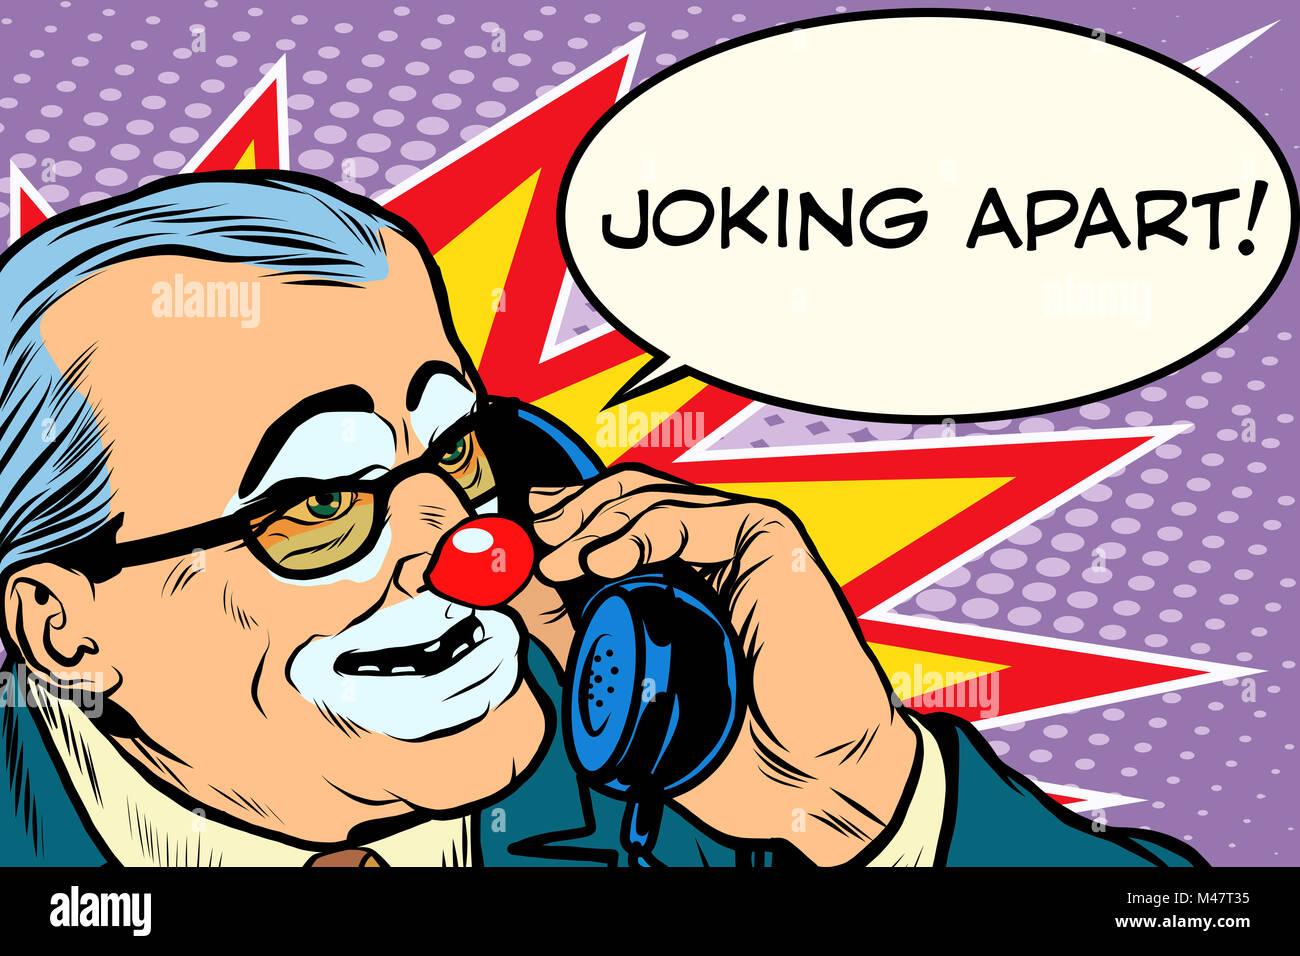 evil clown boss joking apart - Stock Image